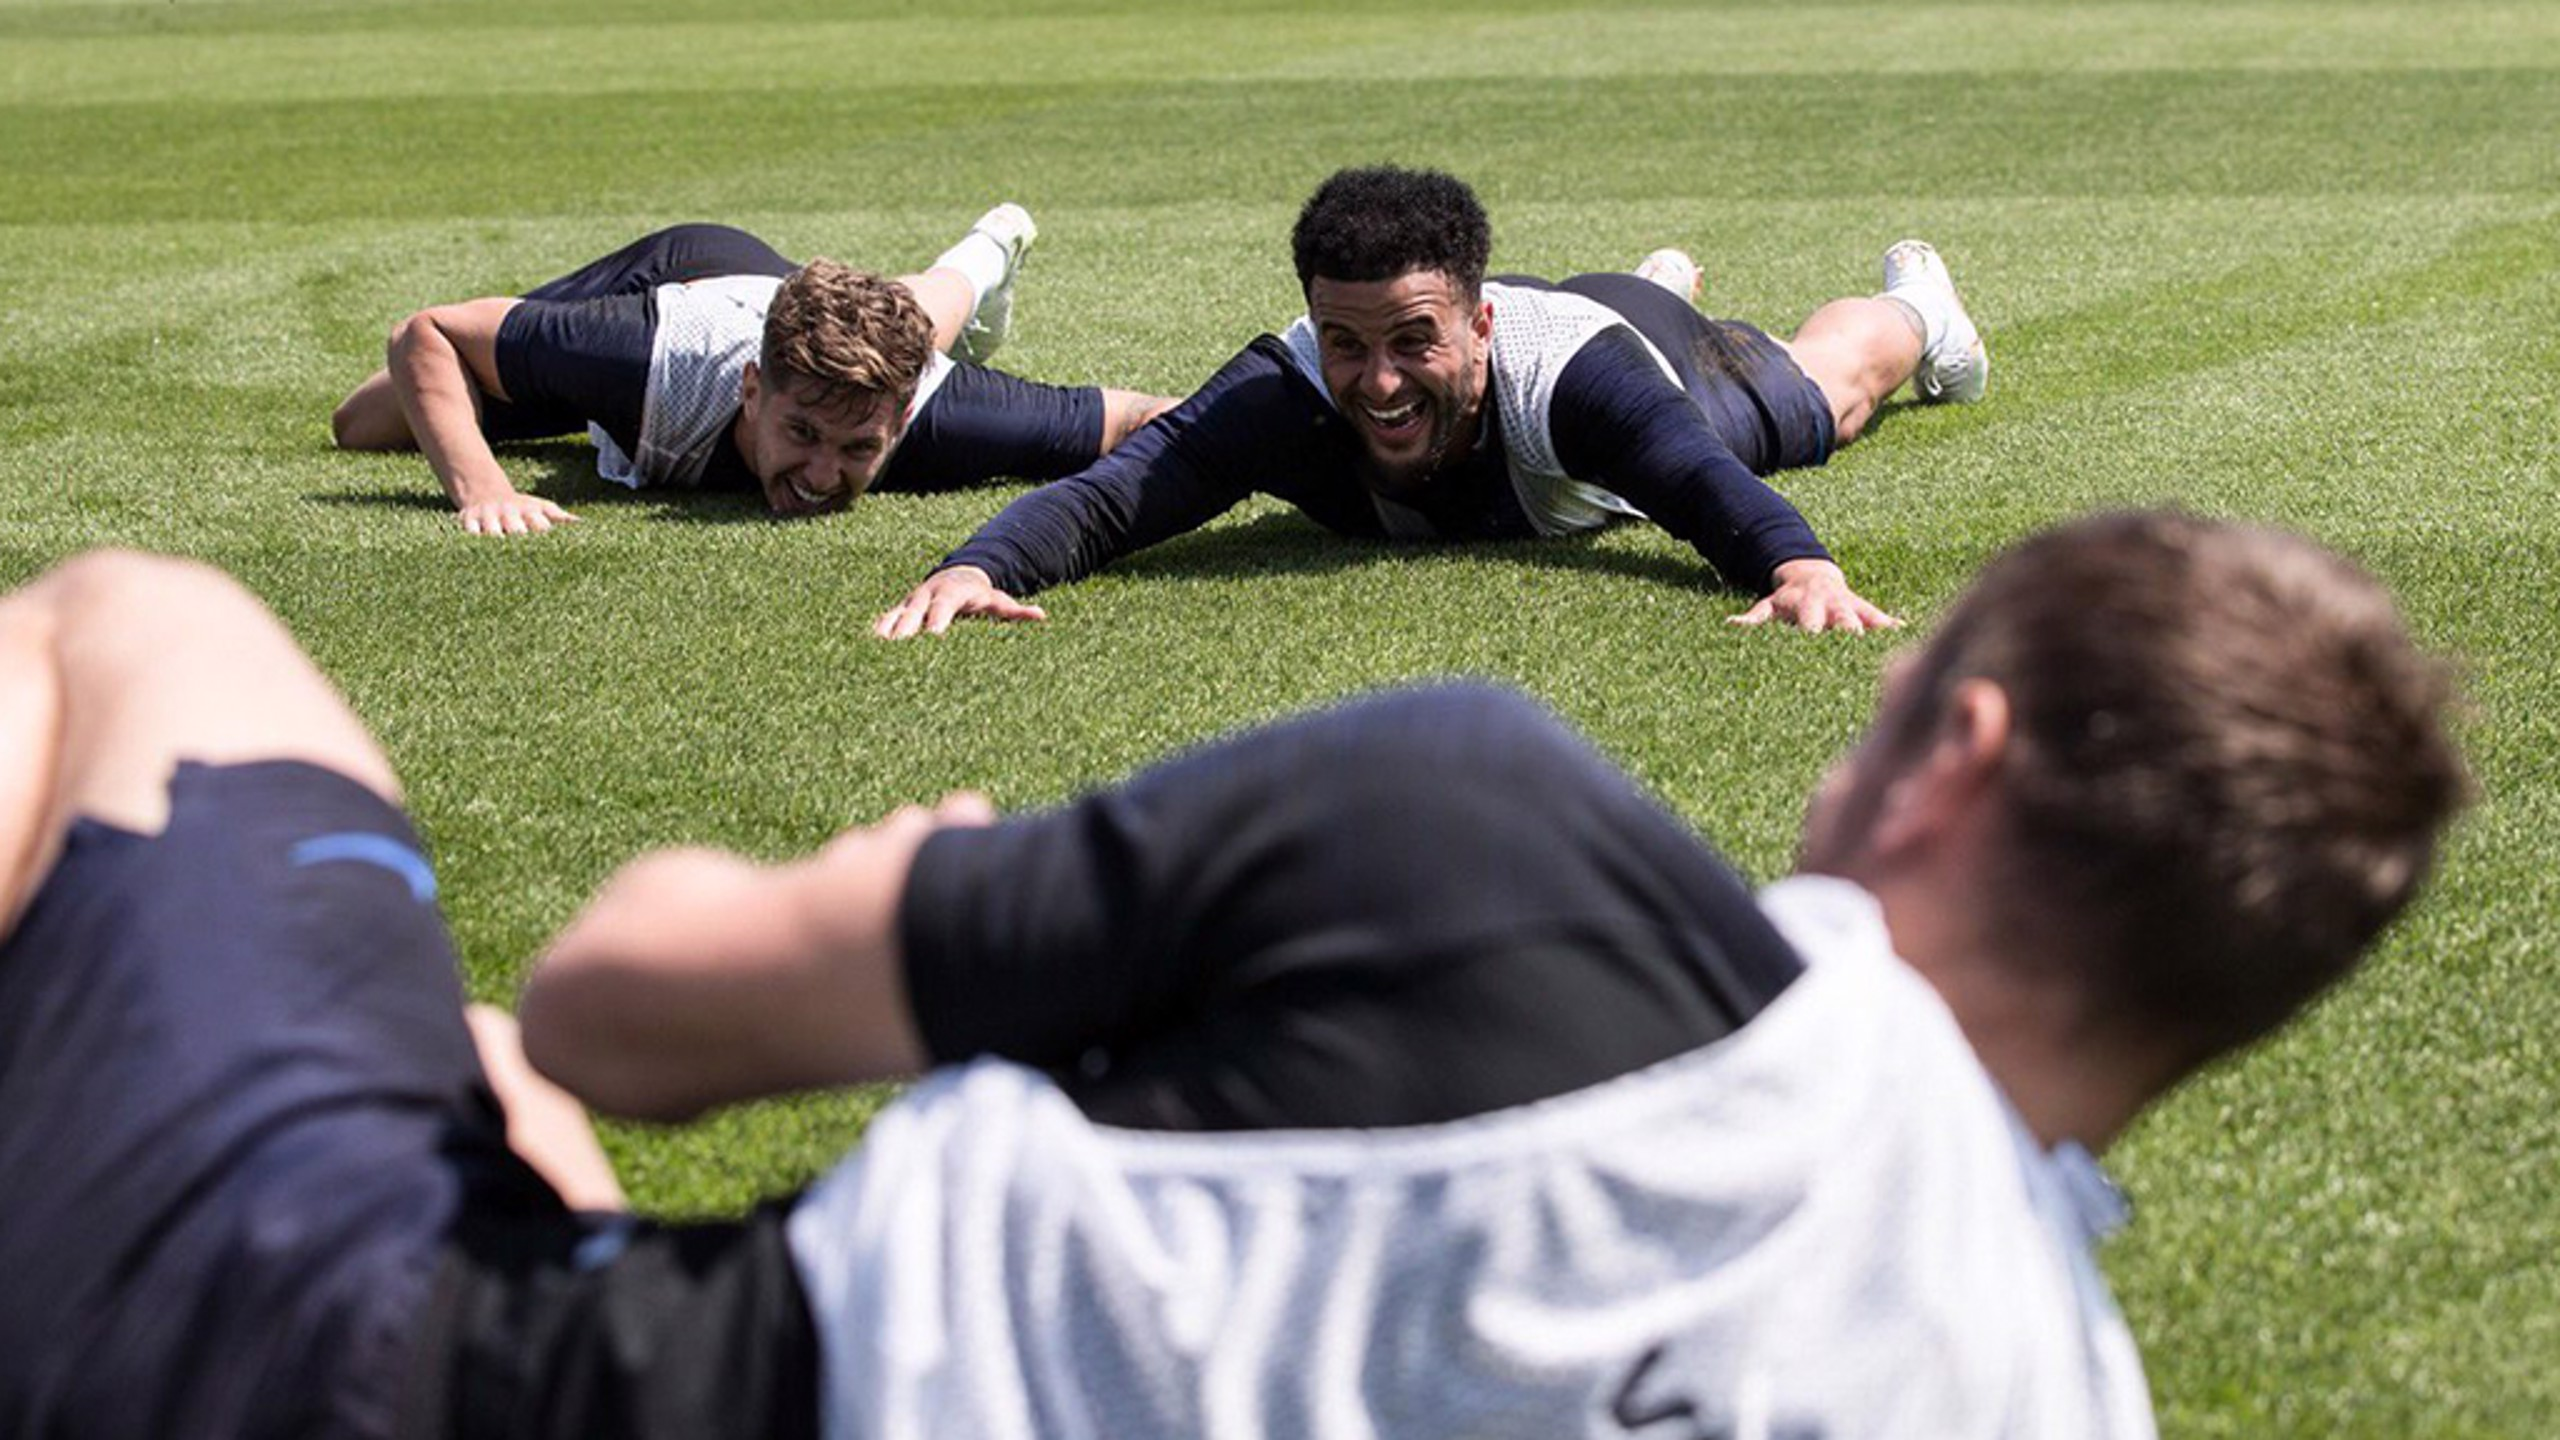 BERCANDA: Kyle dan John bercanda di sesi latihan timnas Inggris